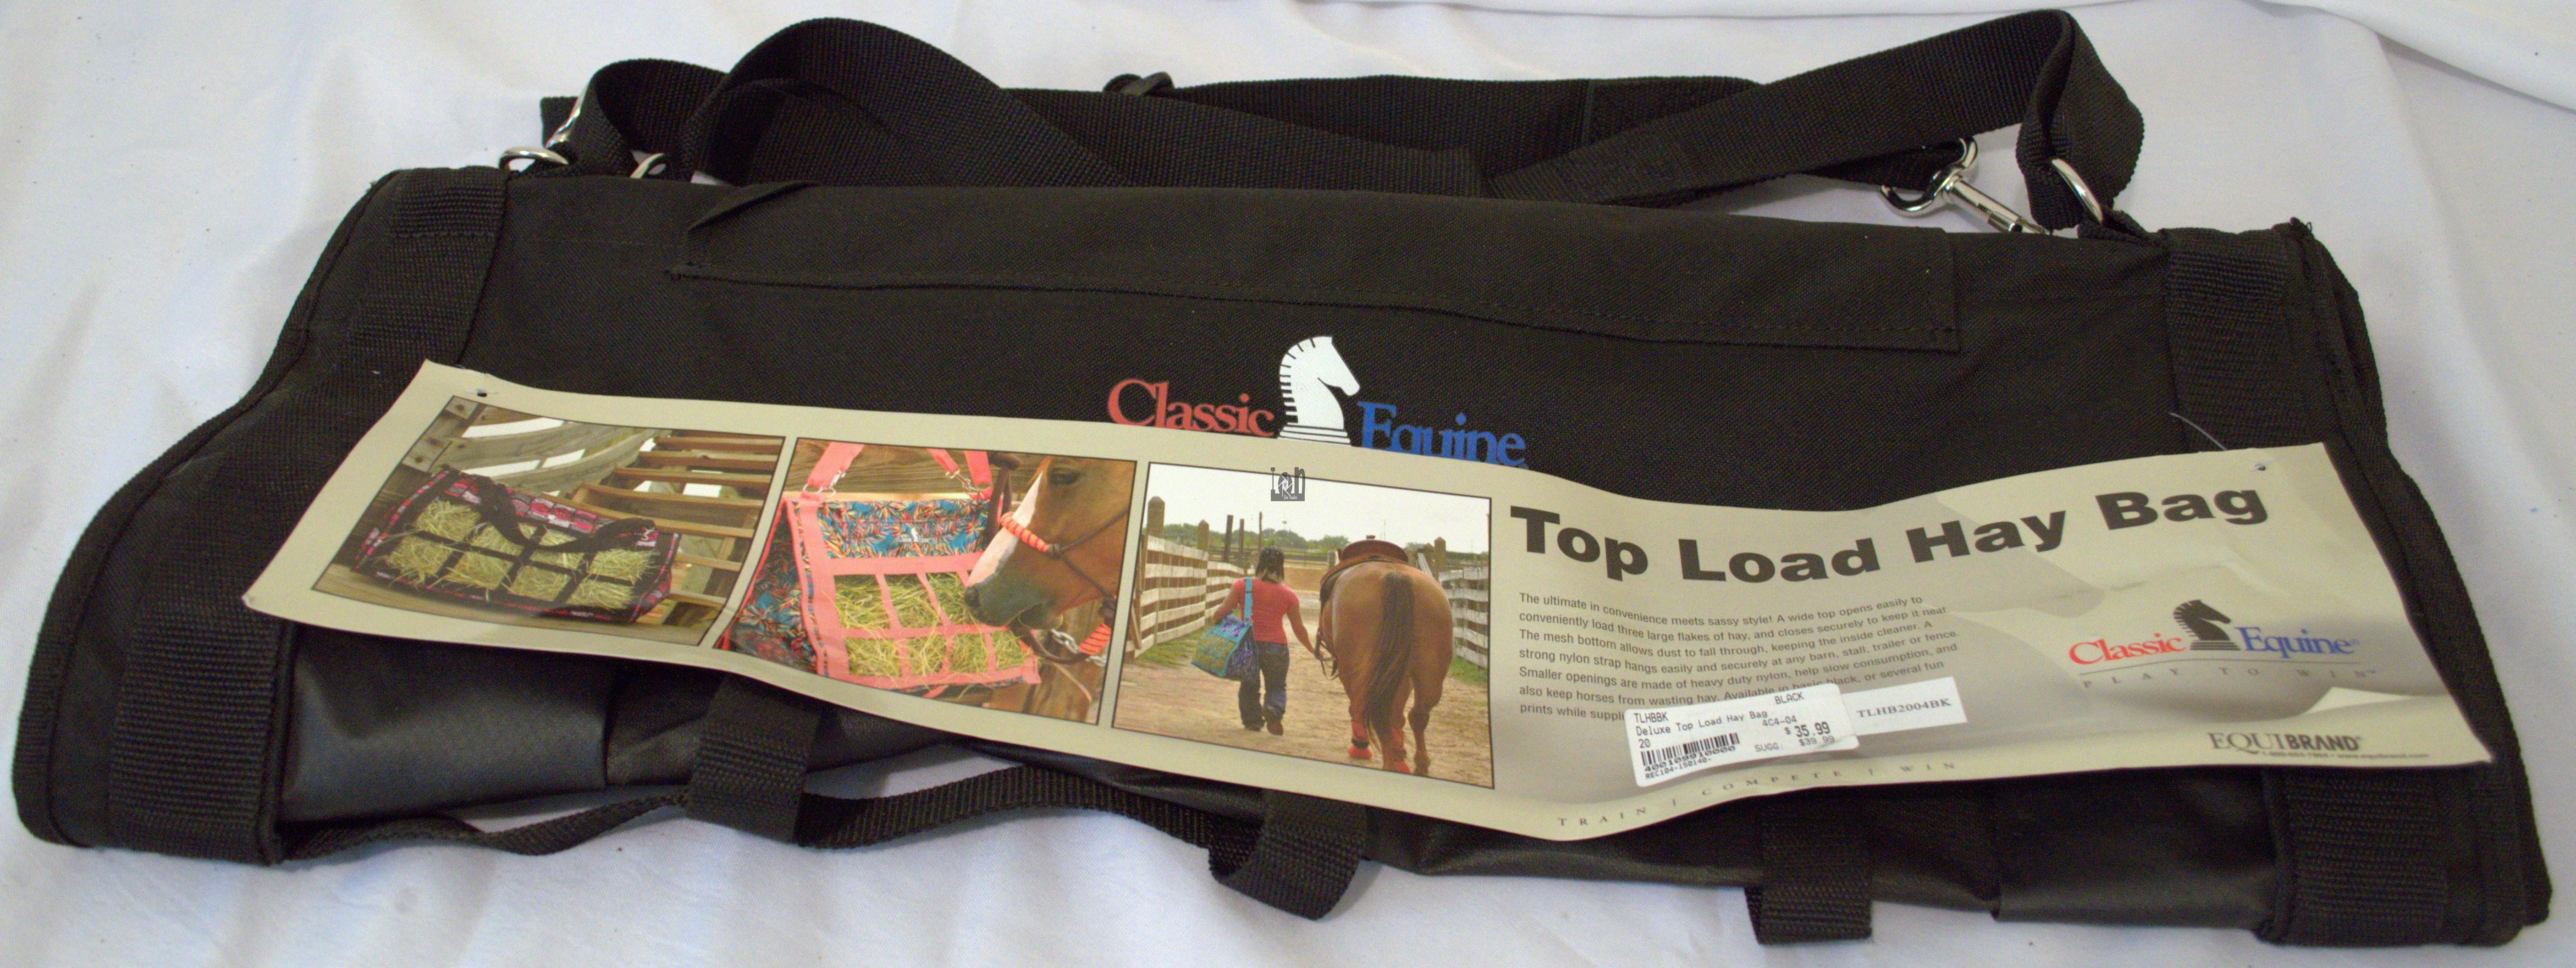 "Classic Equine Top Load Hay Bag BLACK 24"" Horse Feed Tack"